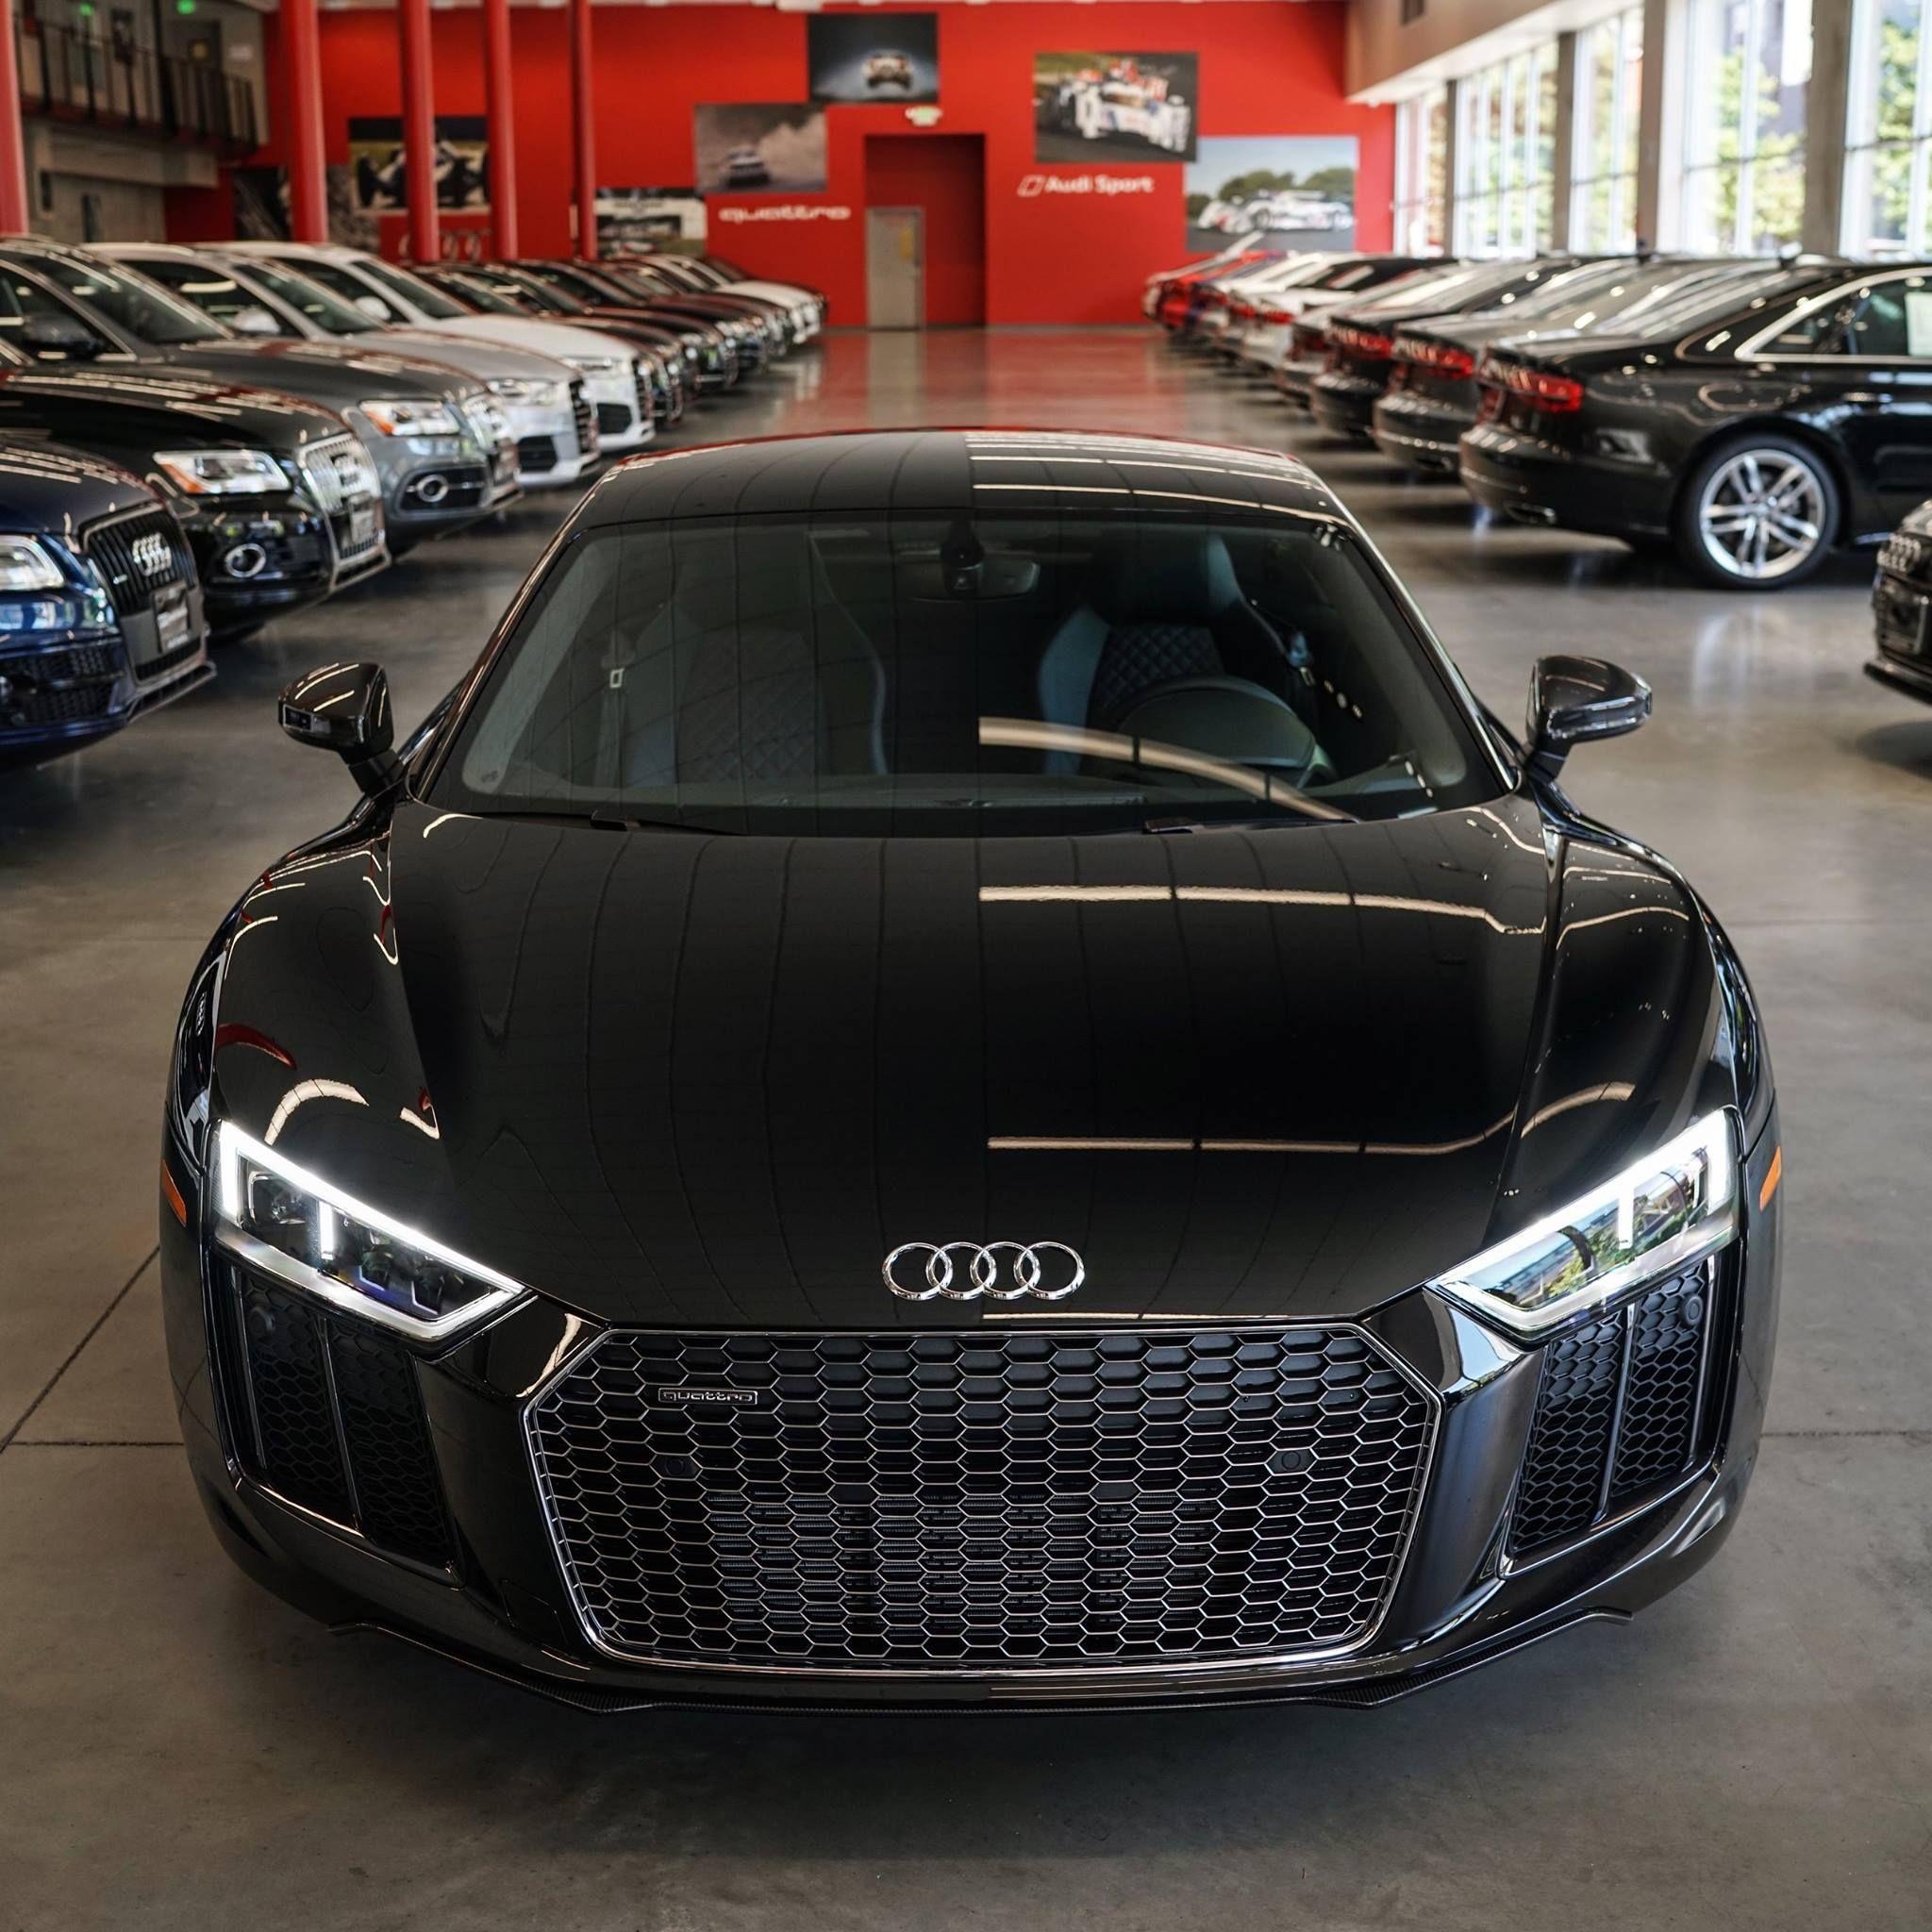 Black R8 V10 Plus Audiseattle Com Seattle Wa Luxury Car Dealership Audi Audi Suv